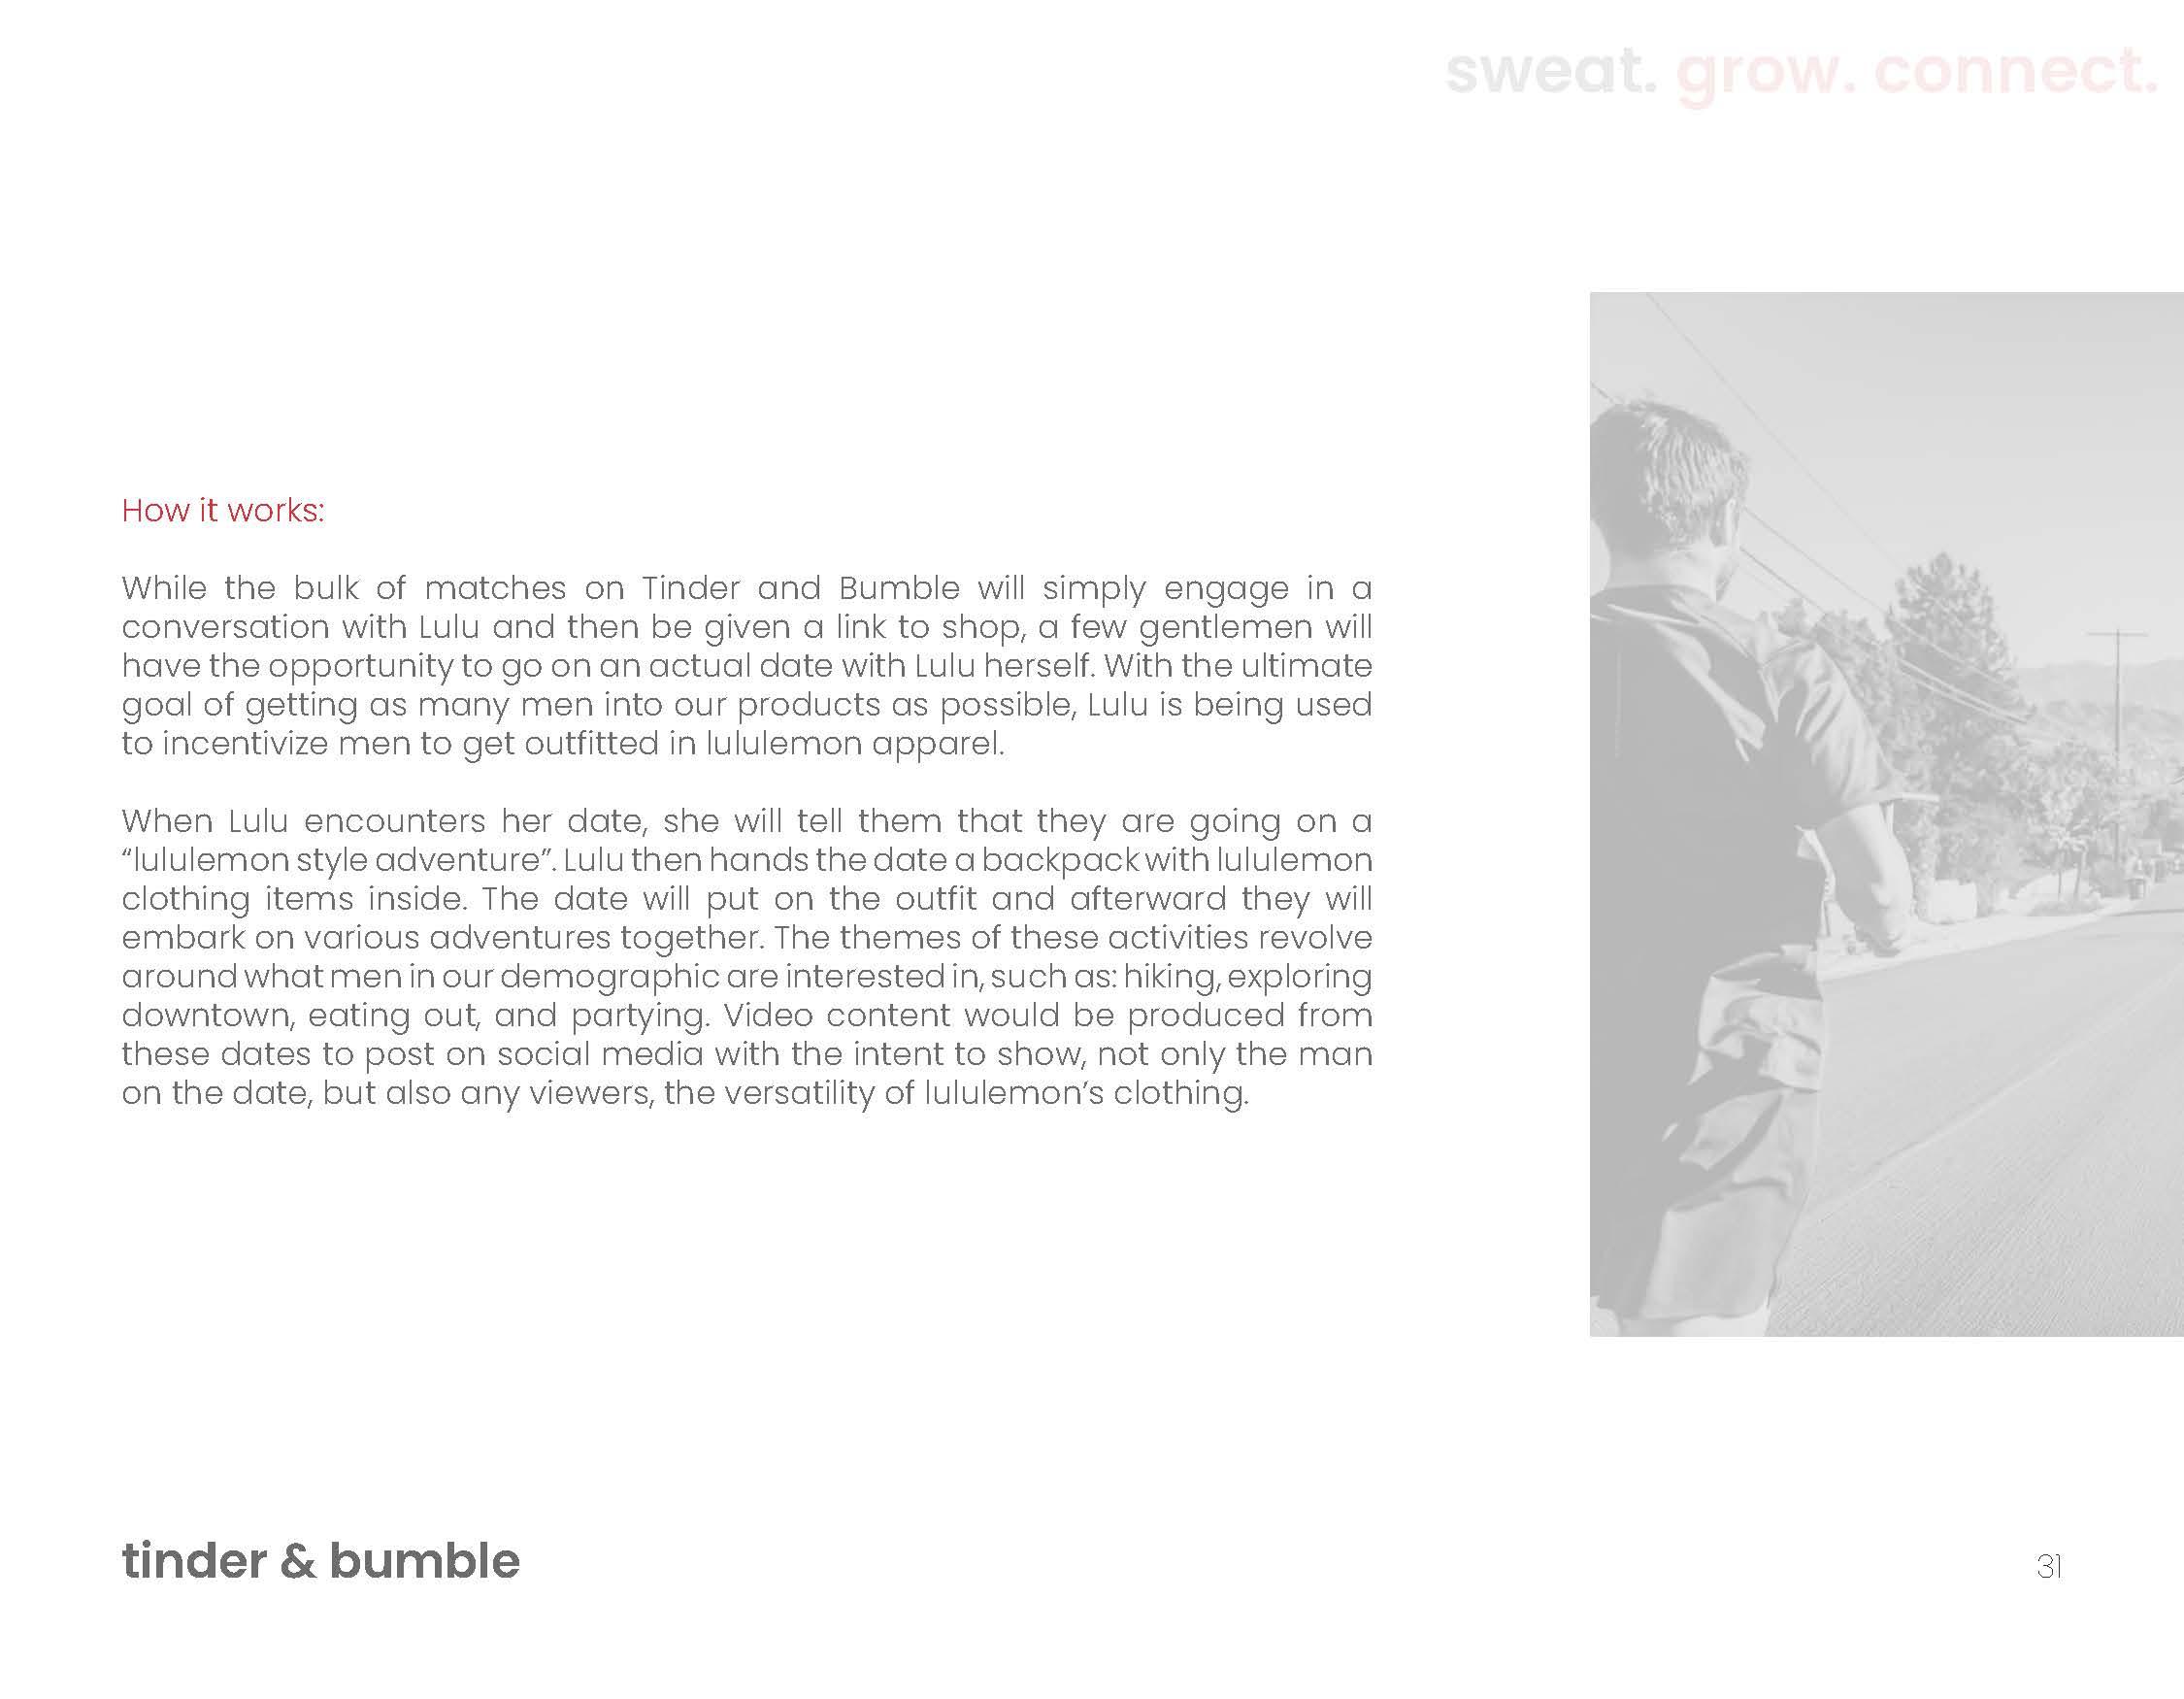 Nellah_FinalPitchBook_Portfolio_lululemon_Page_31.jpg